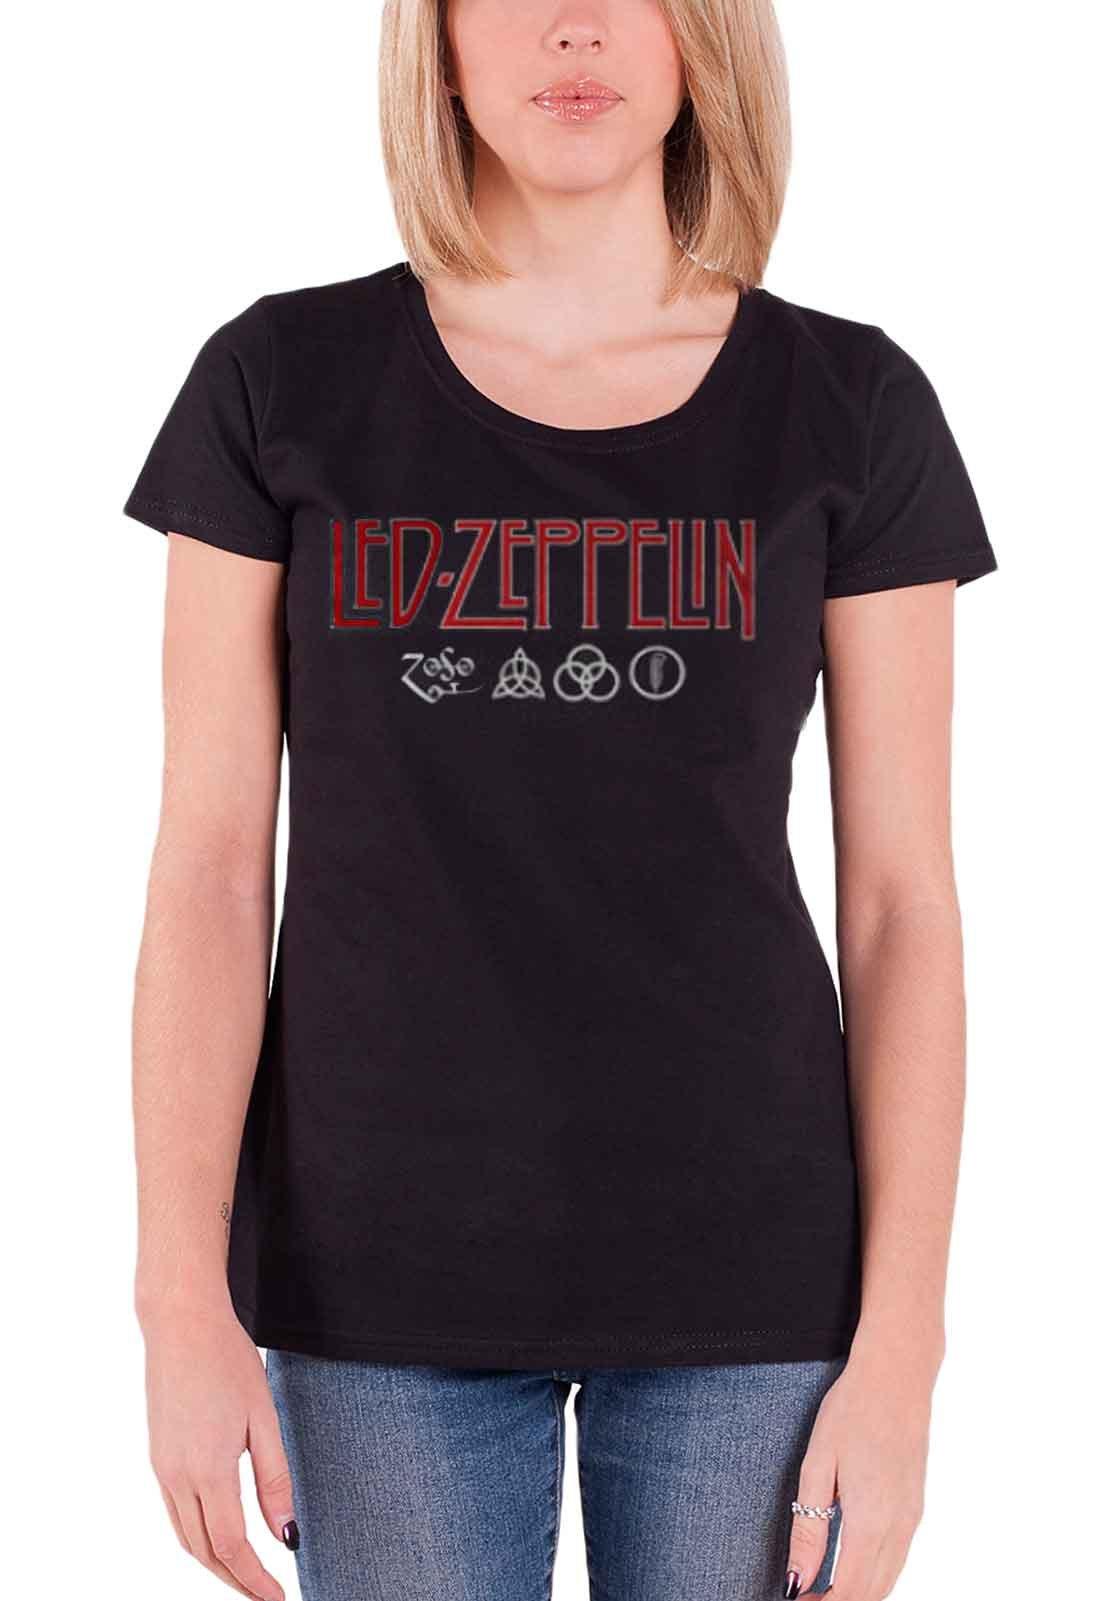 Led Zeppelin T Shirt Logo And Symbol Black